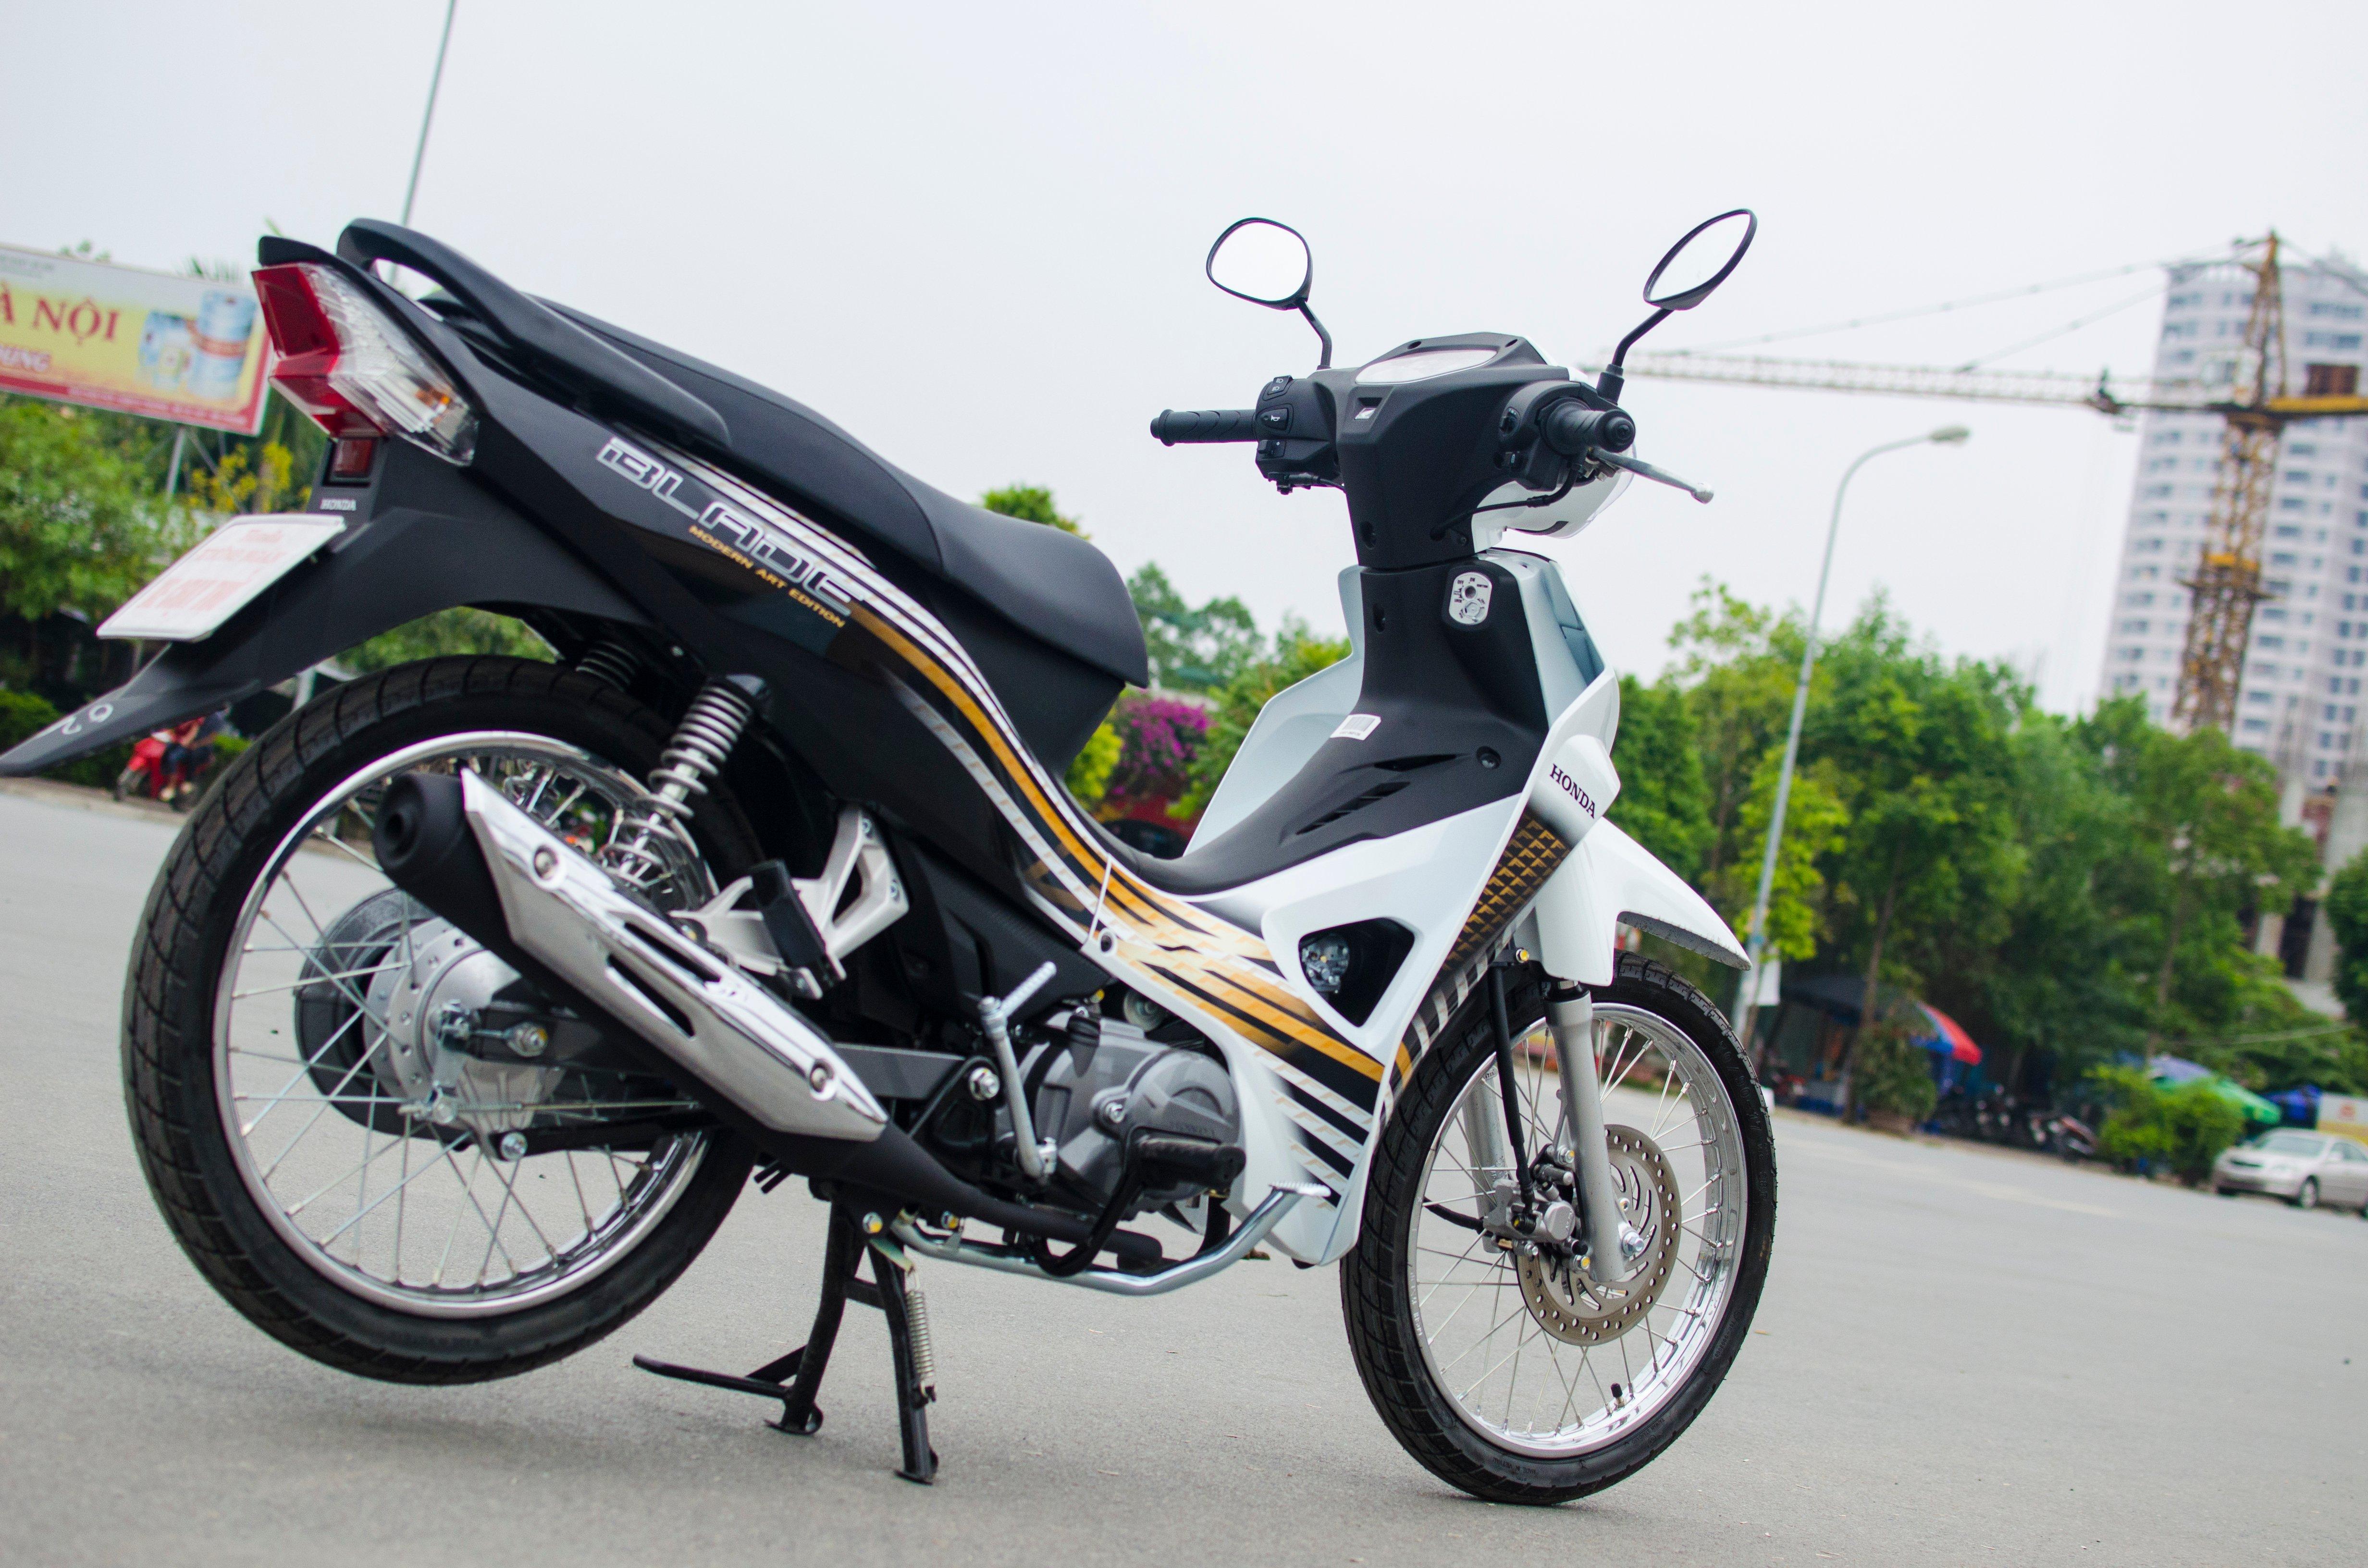 Đánh giá Honda Blade 110 : Vừa đủ cho nhu cầu 6